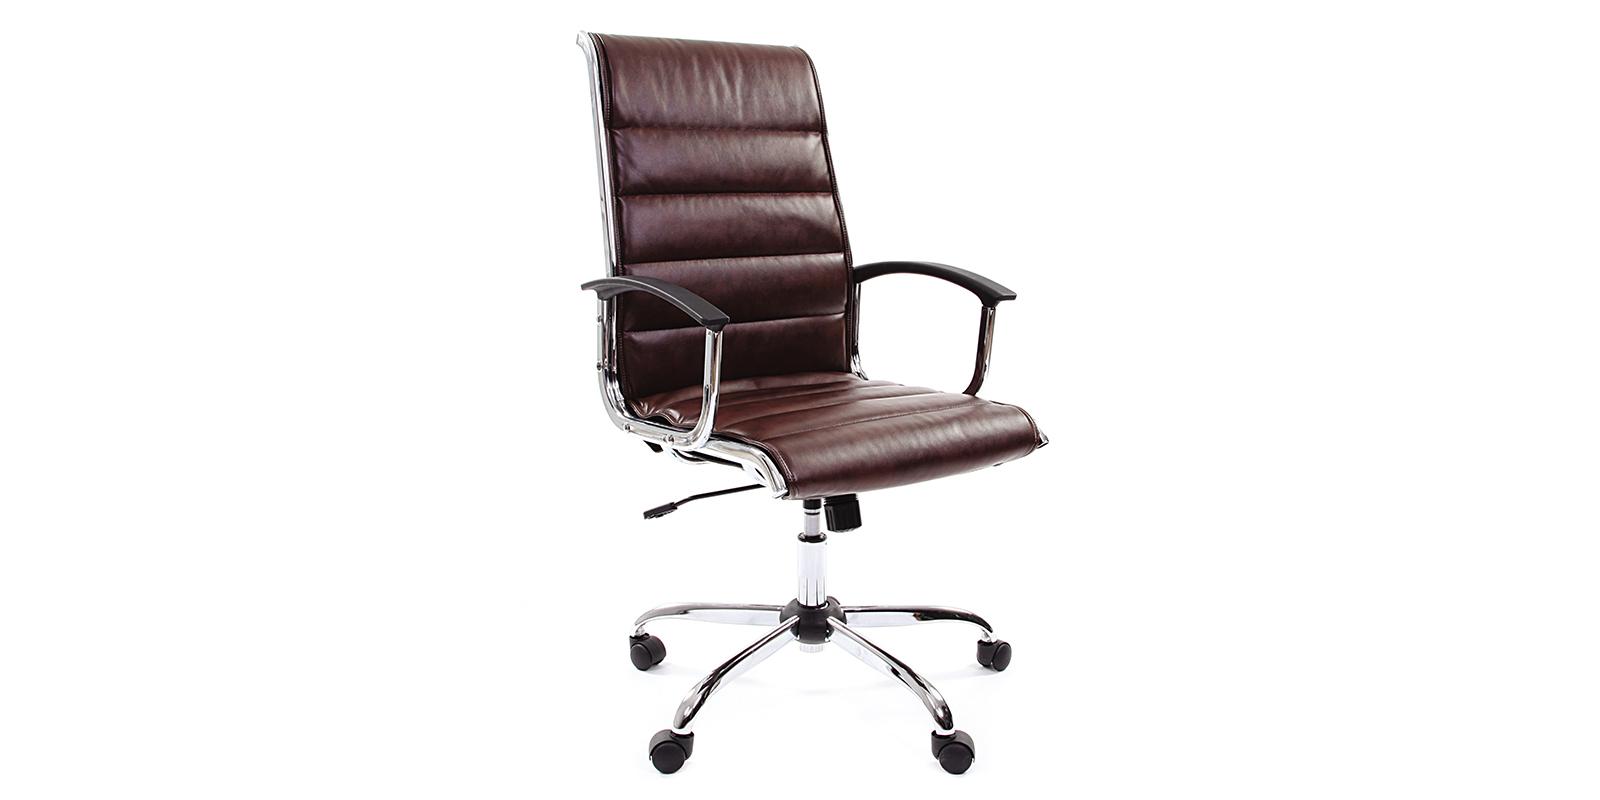 Chairman 760 вариант №1 (коричневый)